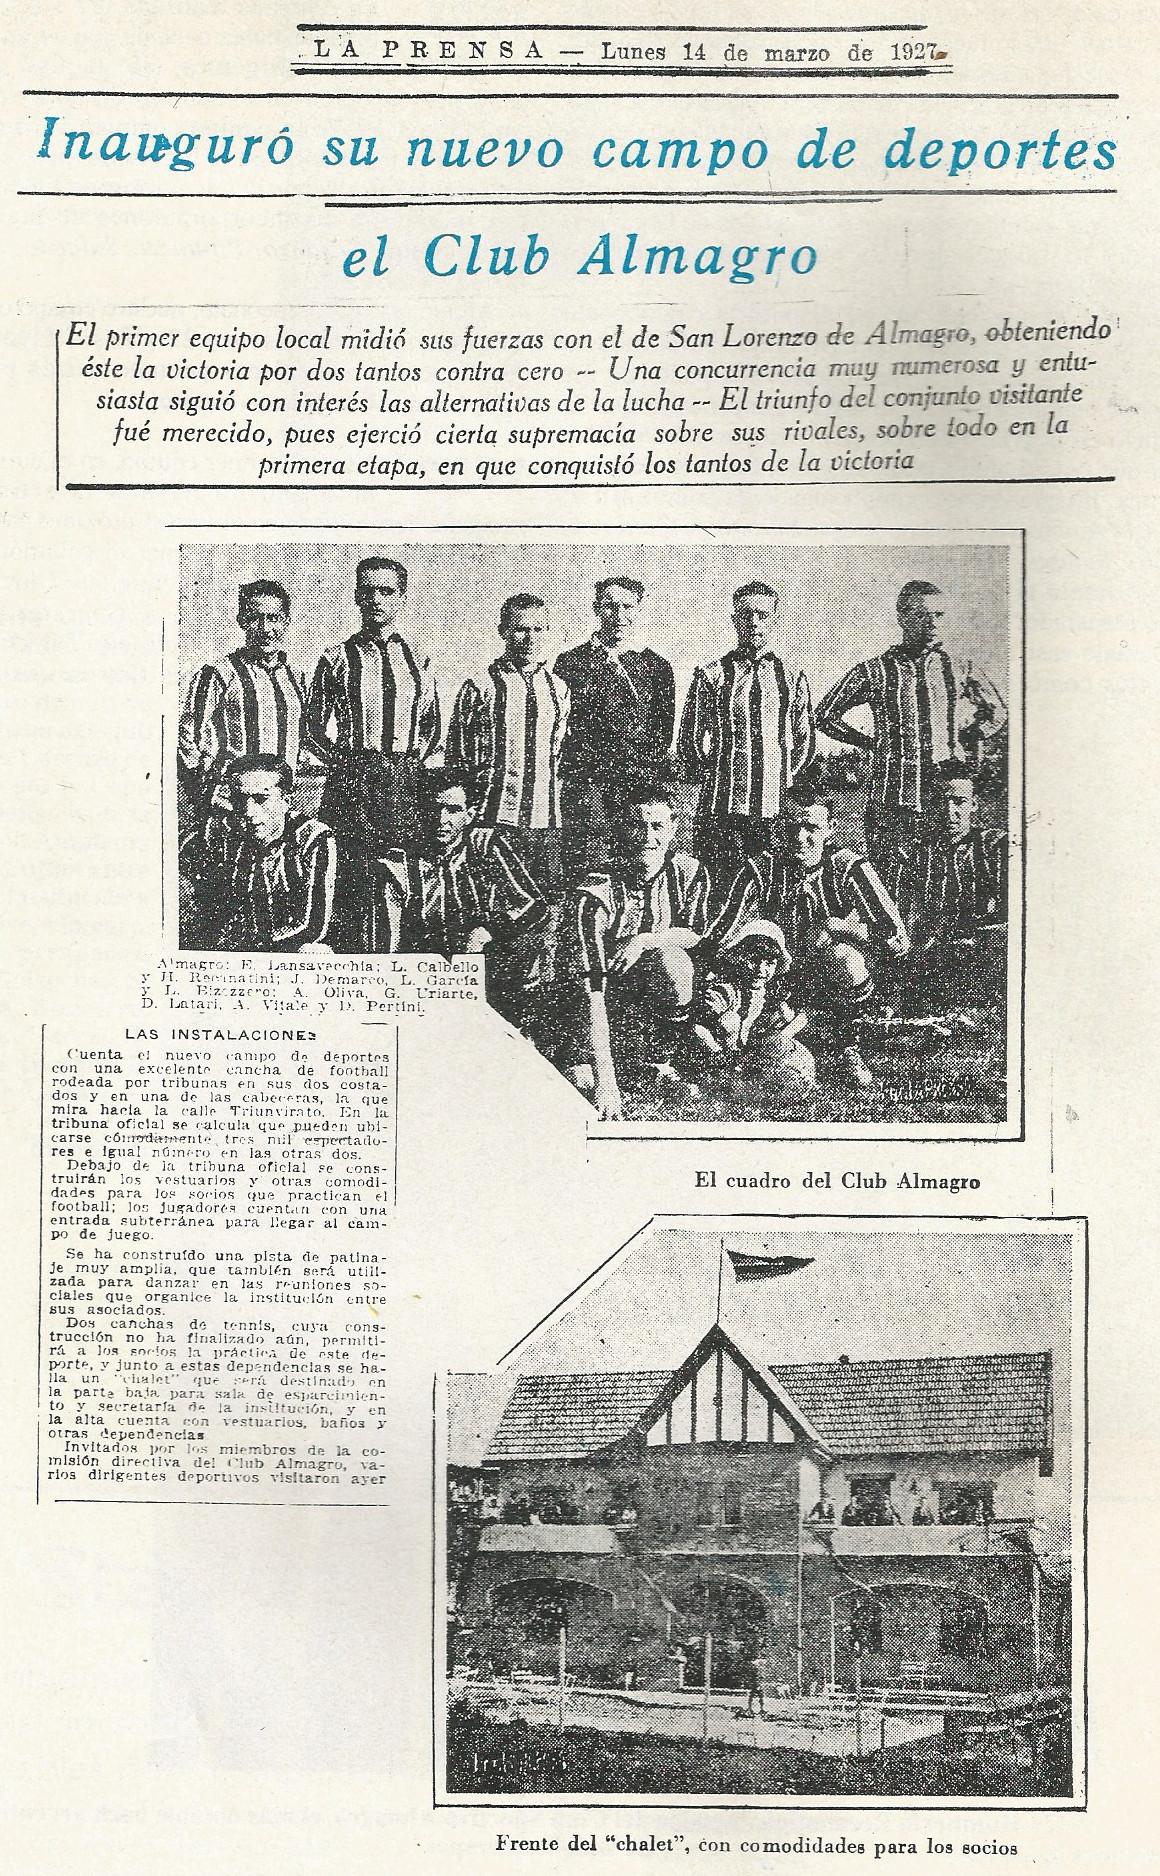 1927 inauguracion estadio